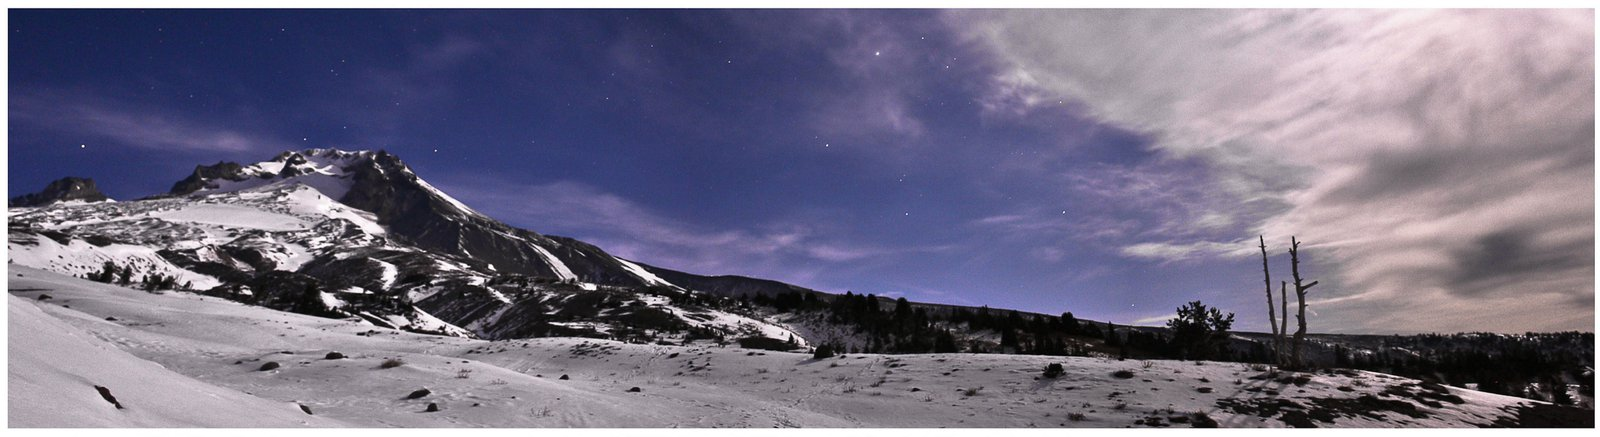 Mt. Hood at night